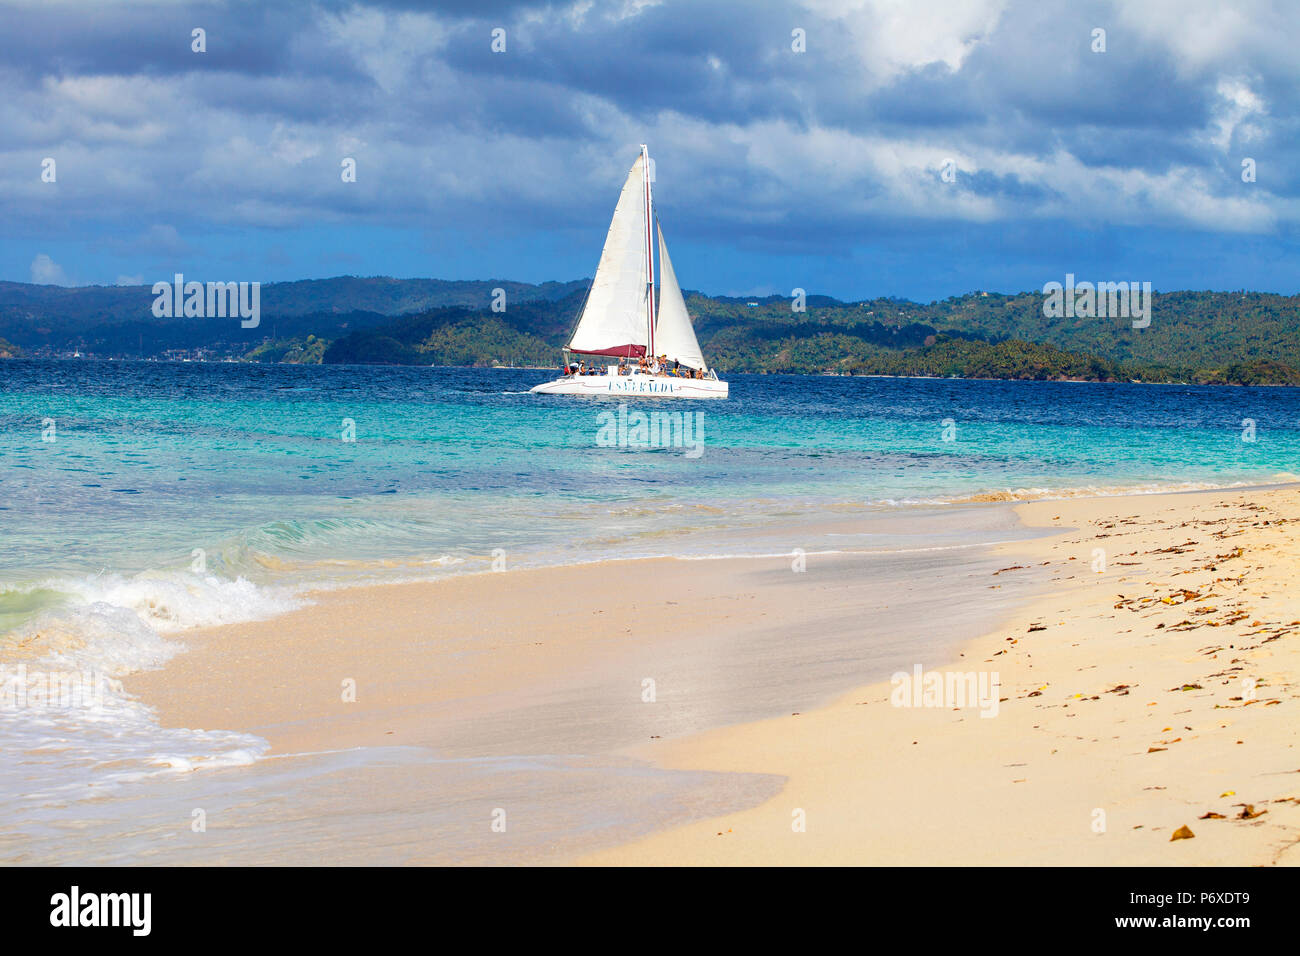 Dominikanische Republik, Östliche Halbinsel de Samana, Samana, Segelboot in der Nähe von Cayo Levantado wissen wie Bacardi Insel Stockbild